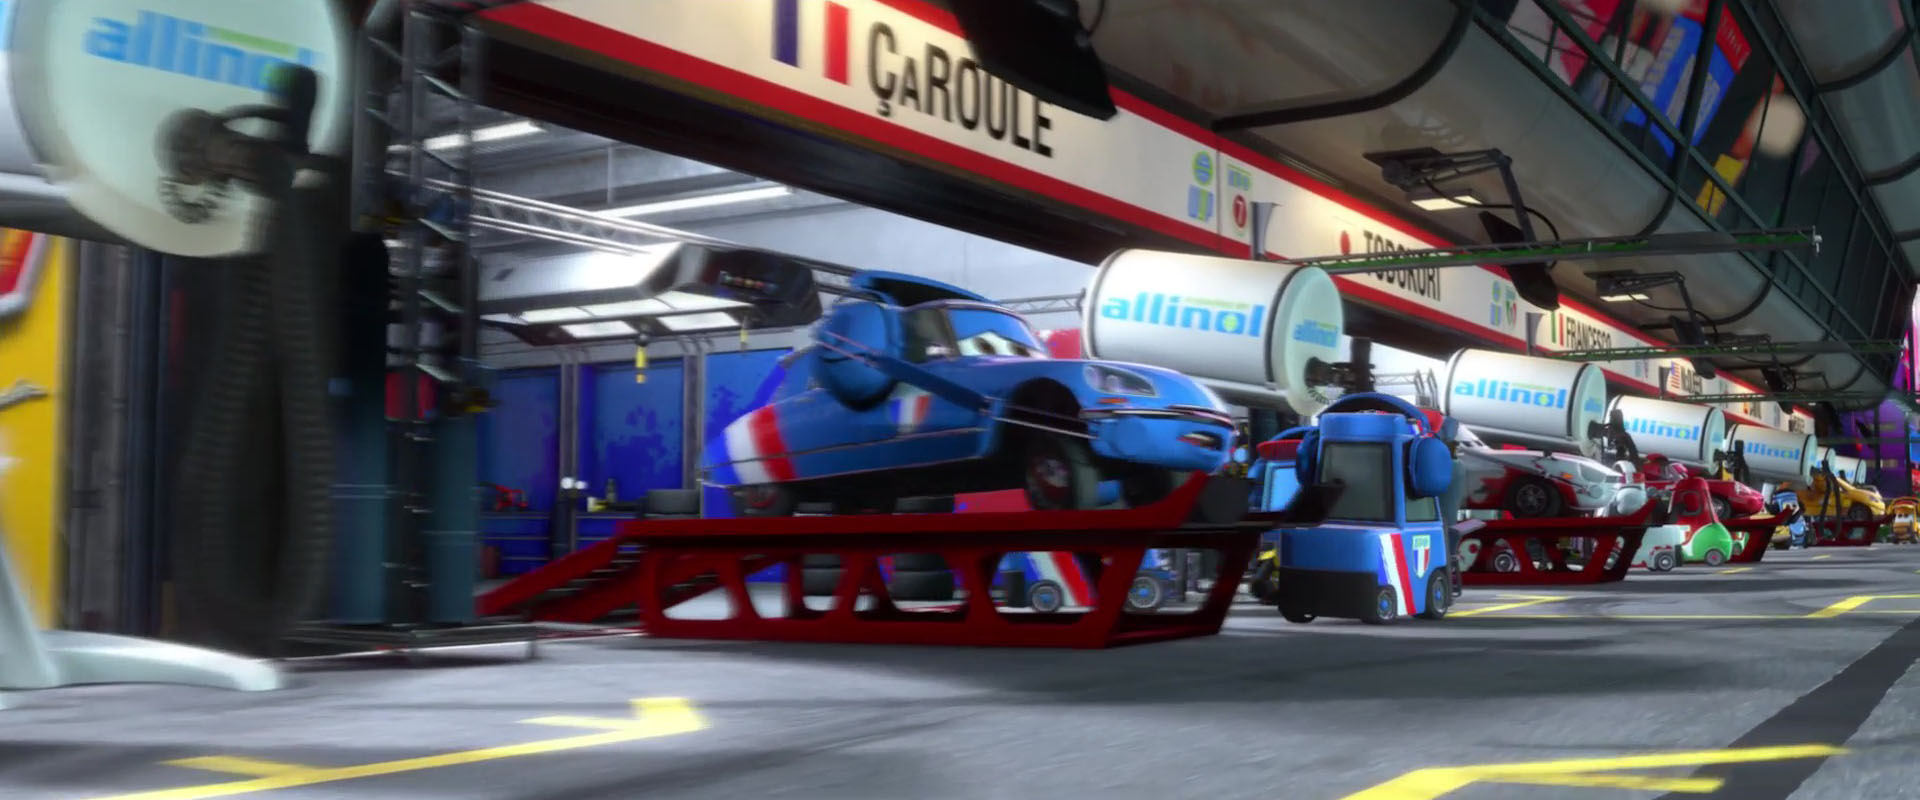 bruno-motoreau-personnage-cars-2-01